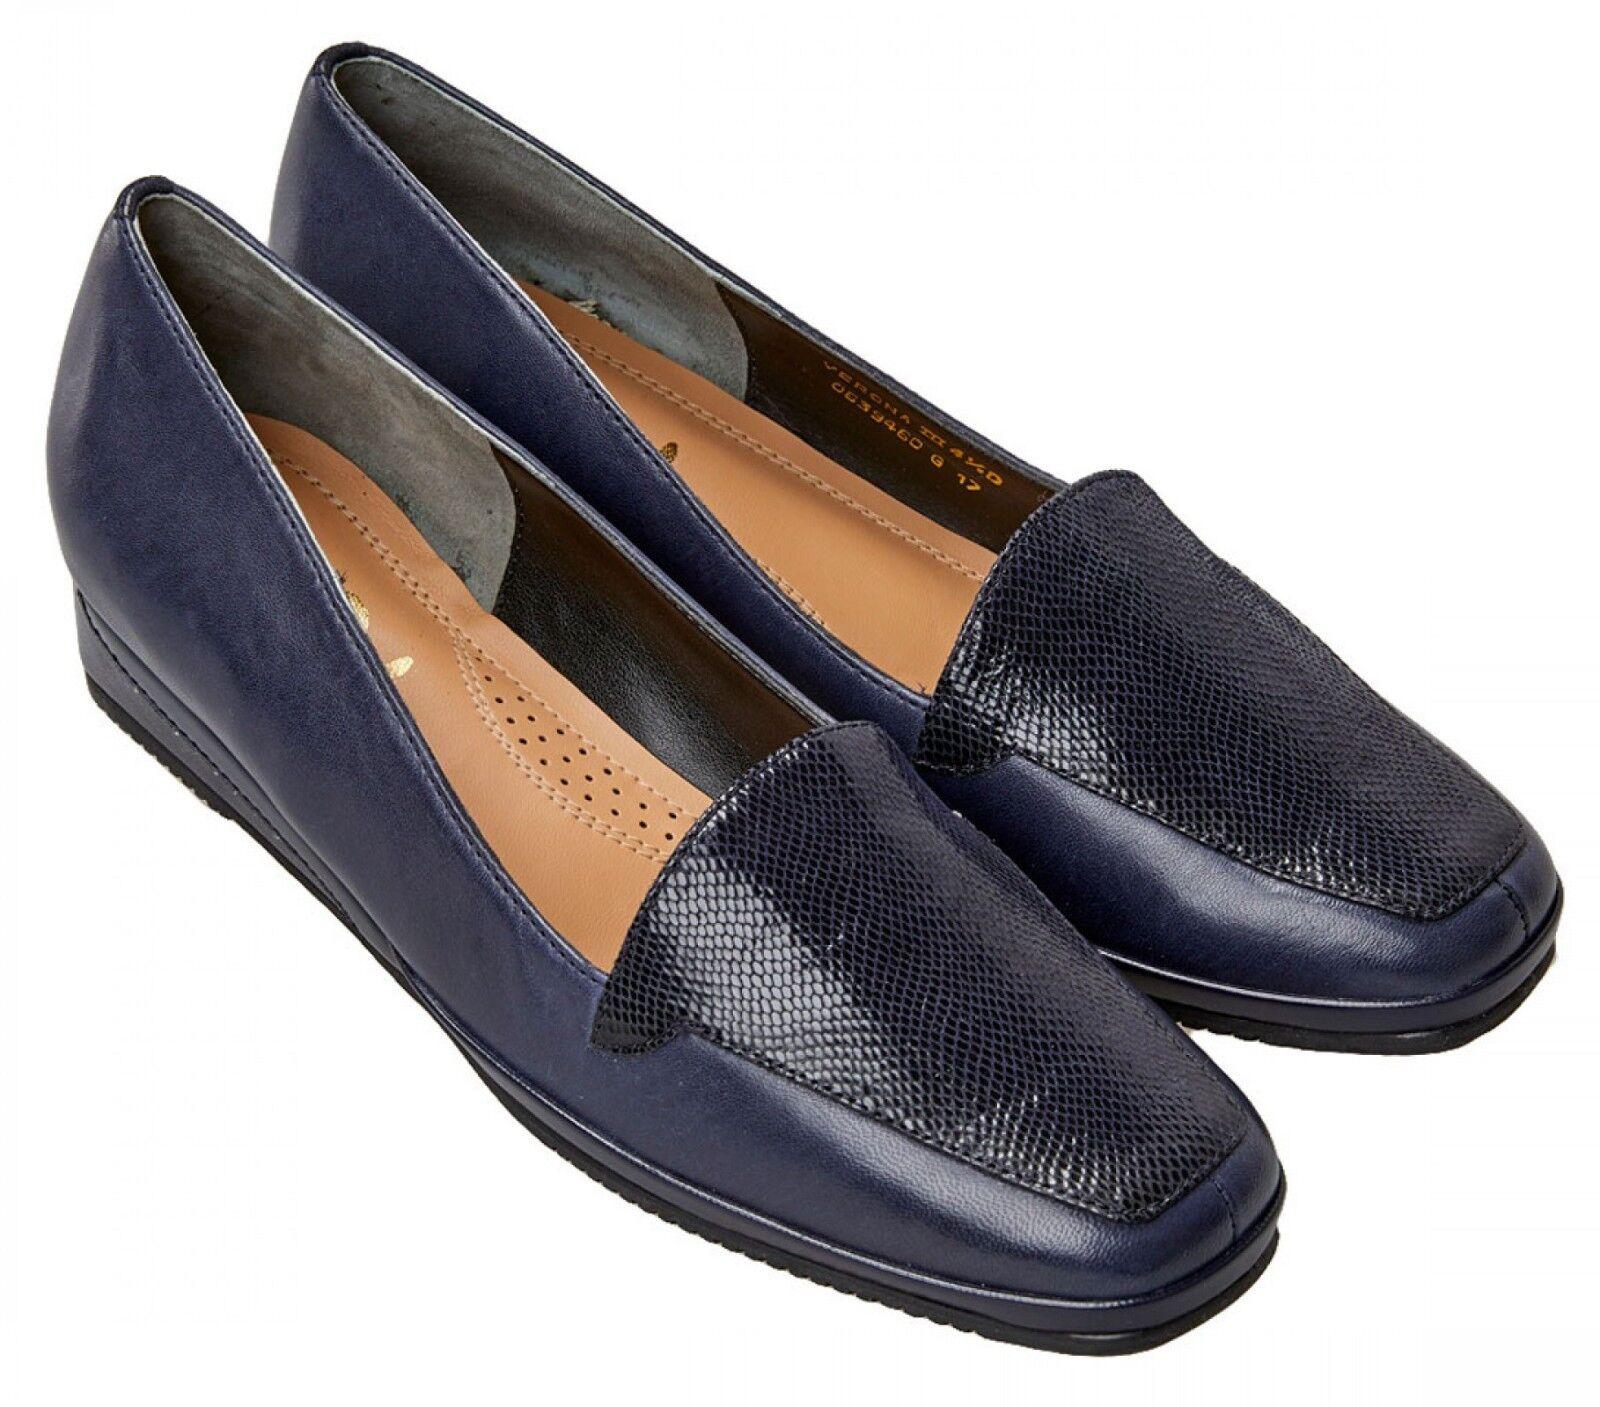 Ladies Casual shoes Van Dal Verona III Midnight   Reptile Print UK Size 6 D Fit